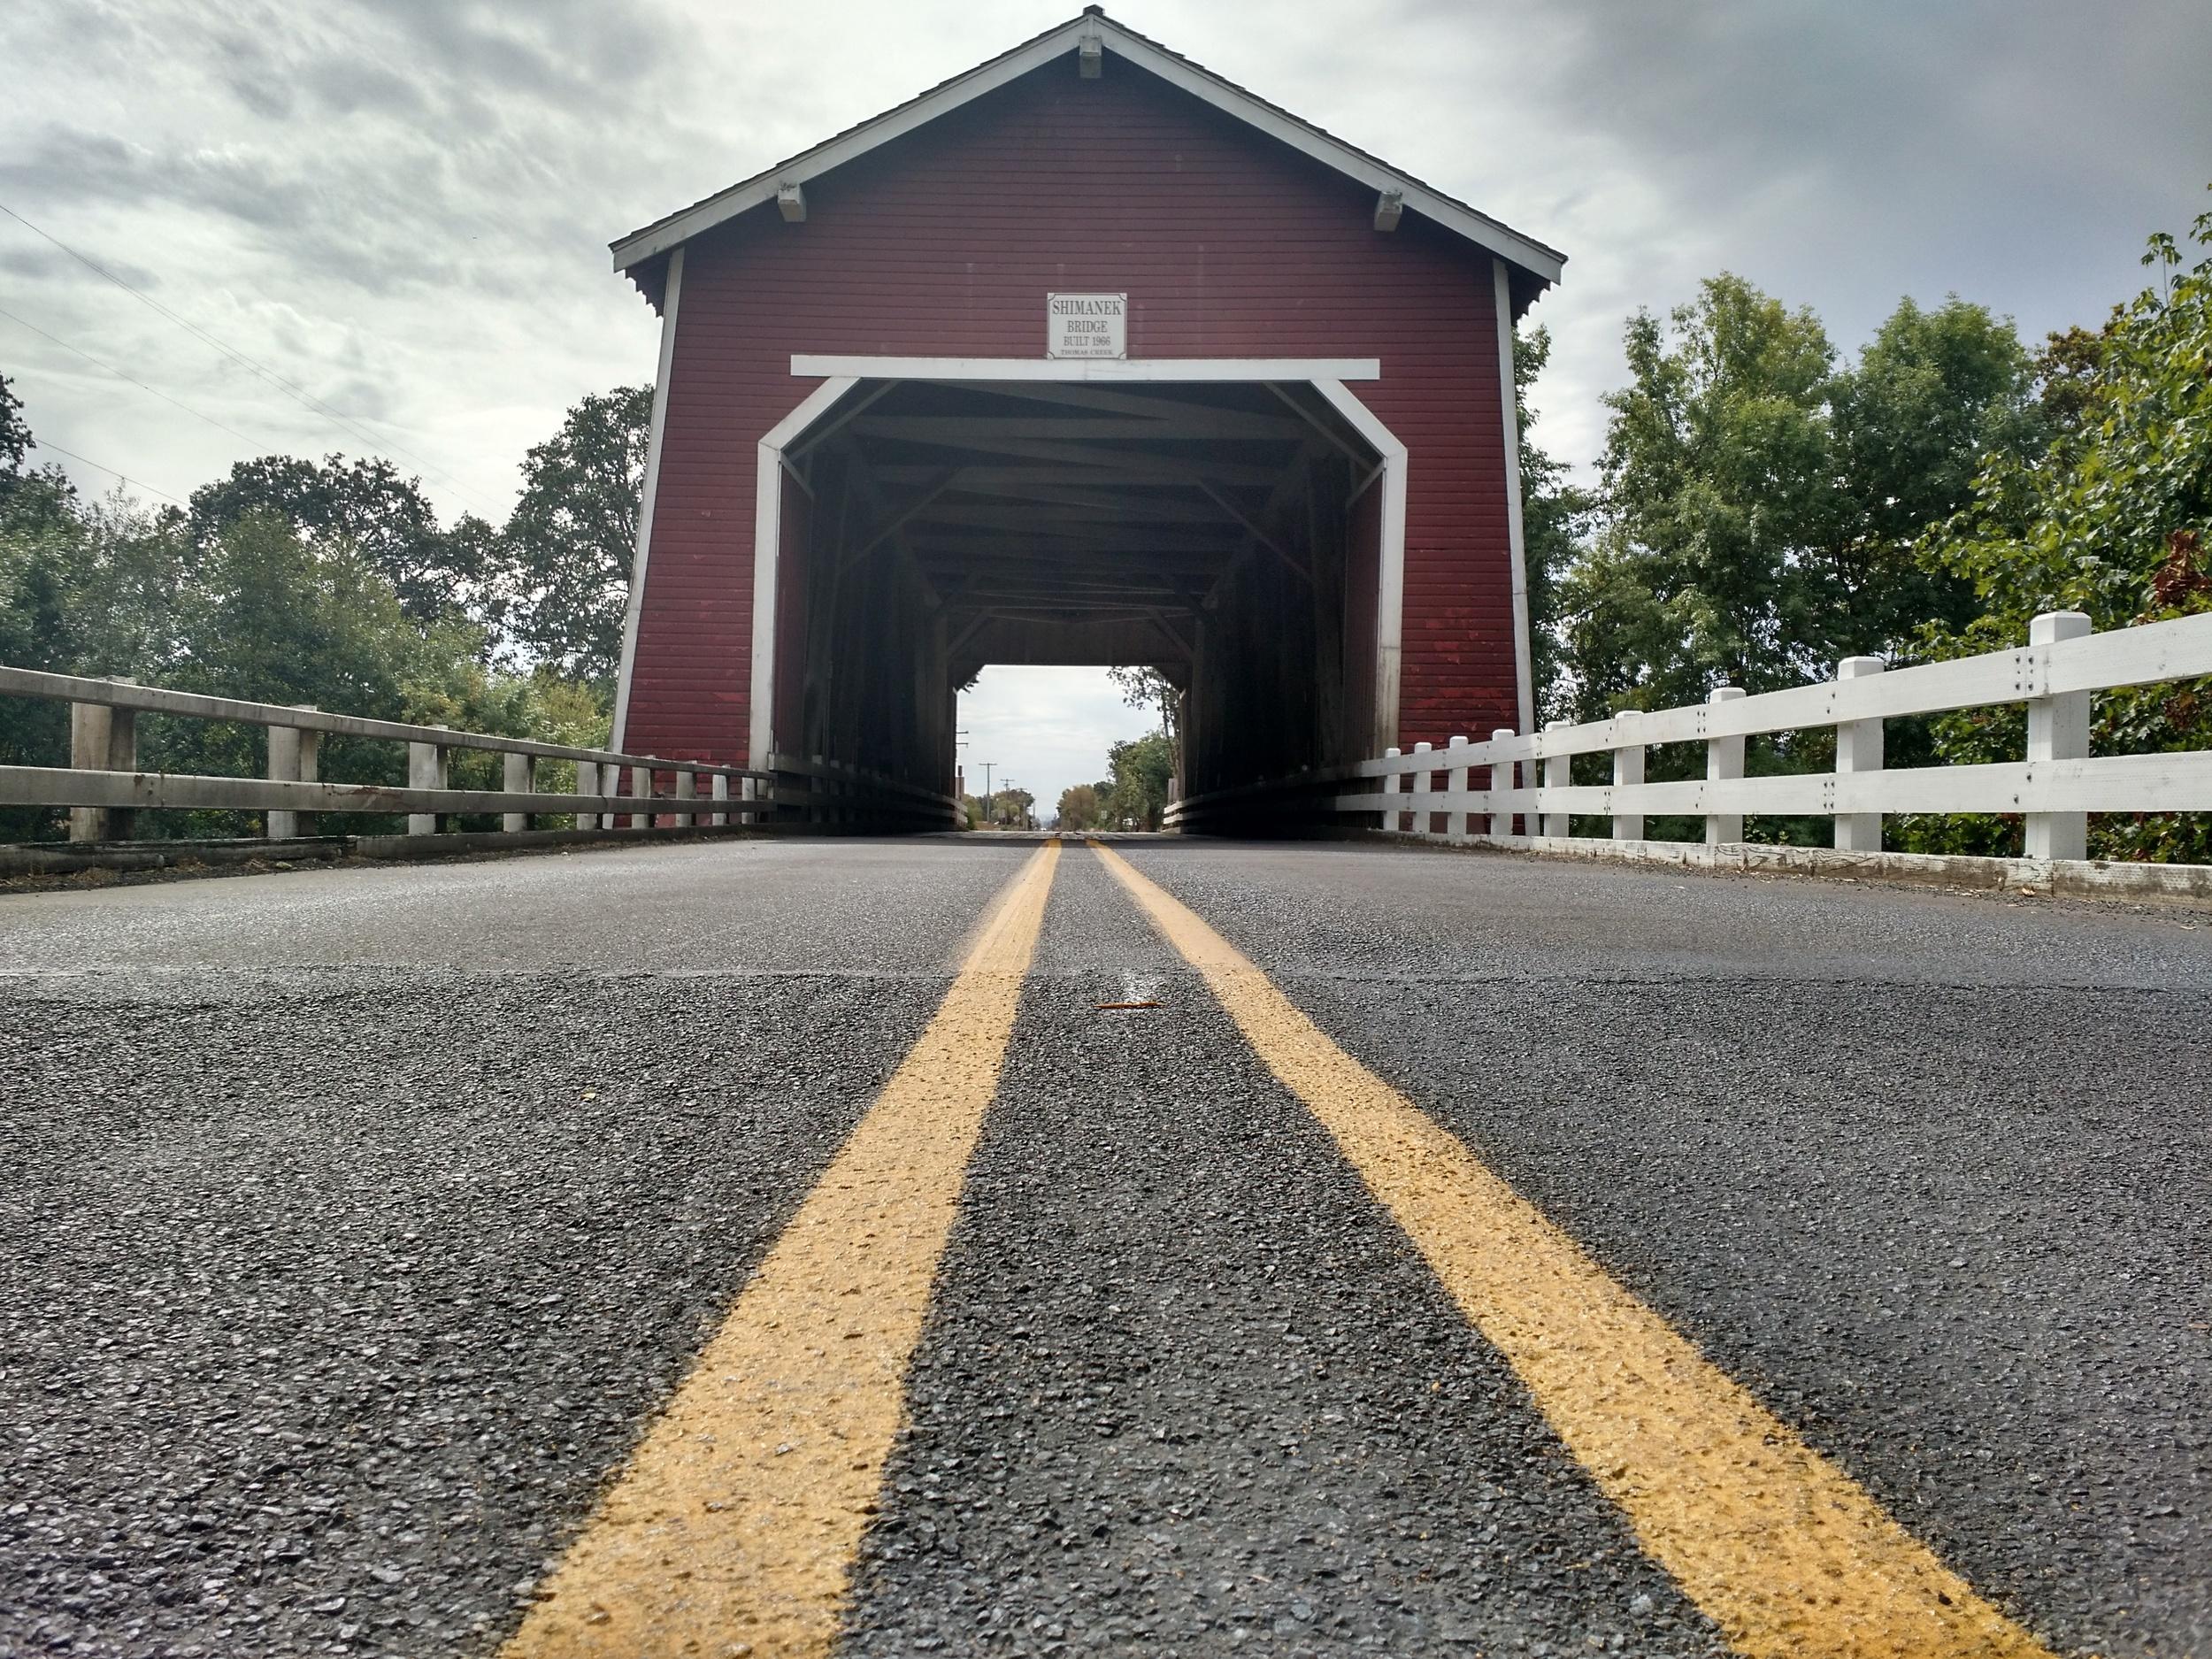 Touring Covered Bridges of Oregon